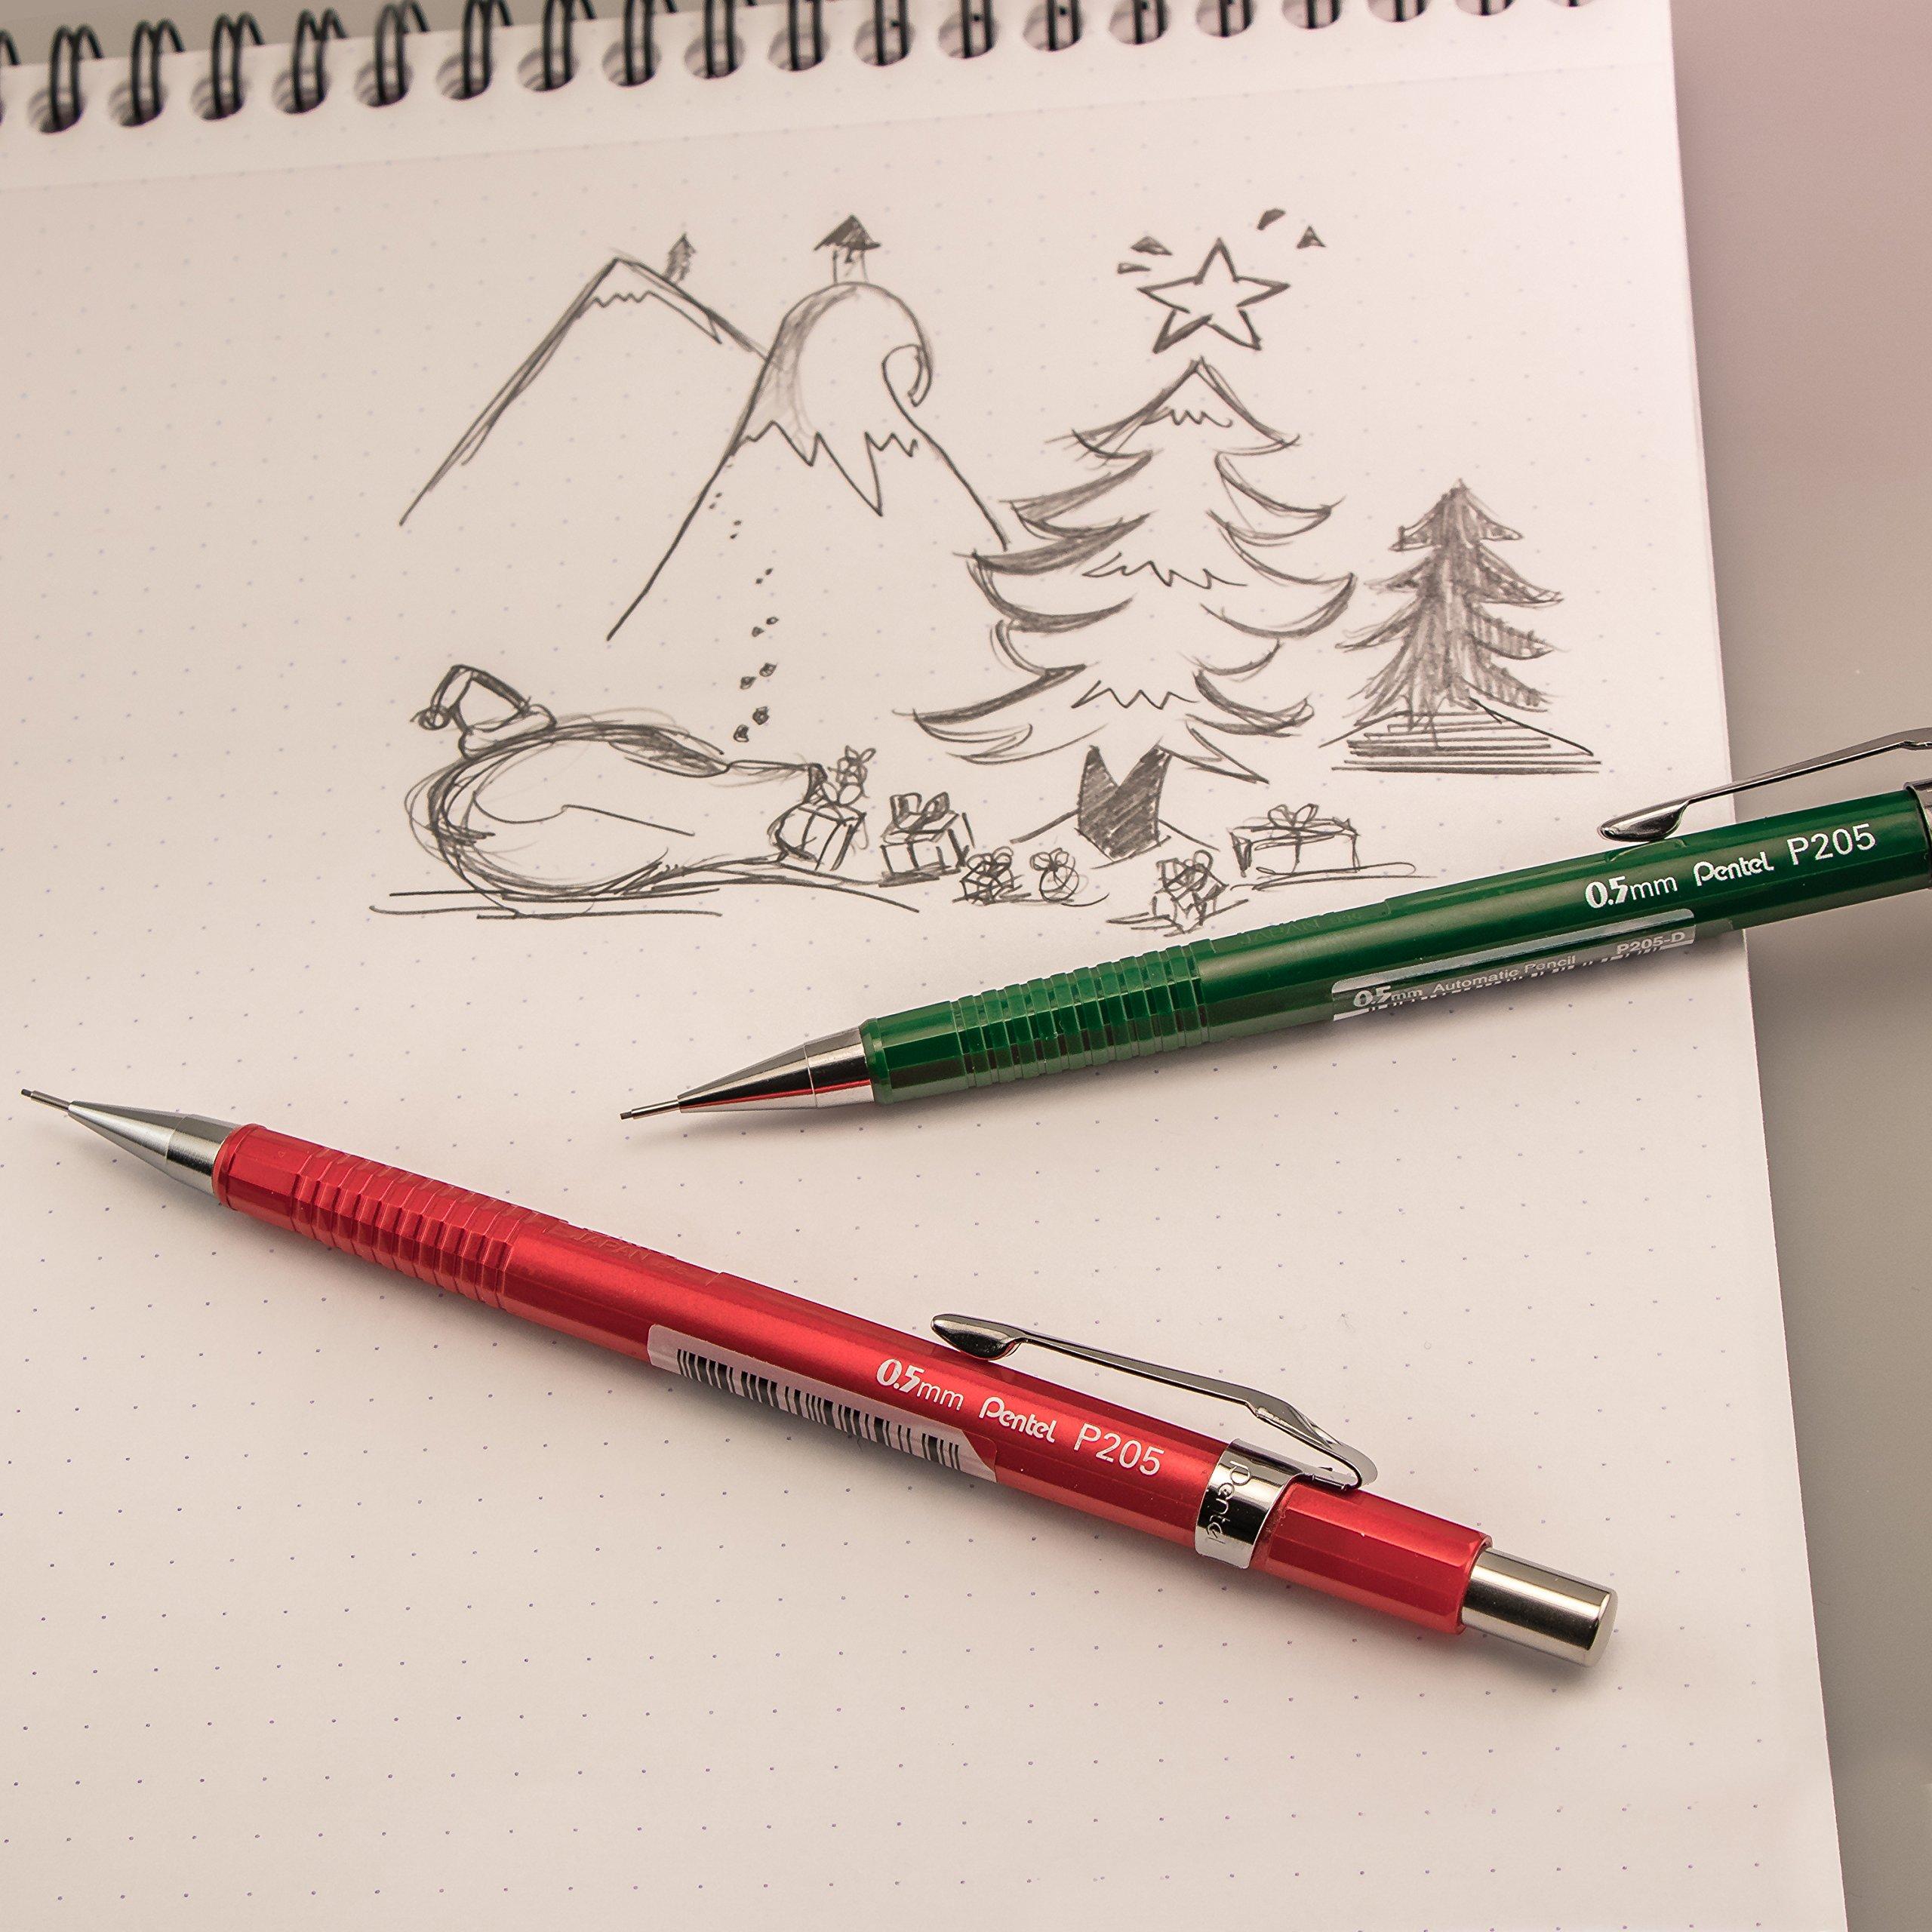 Pentel Sharp Automatic Pencil by Pentel (Image #8)